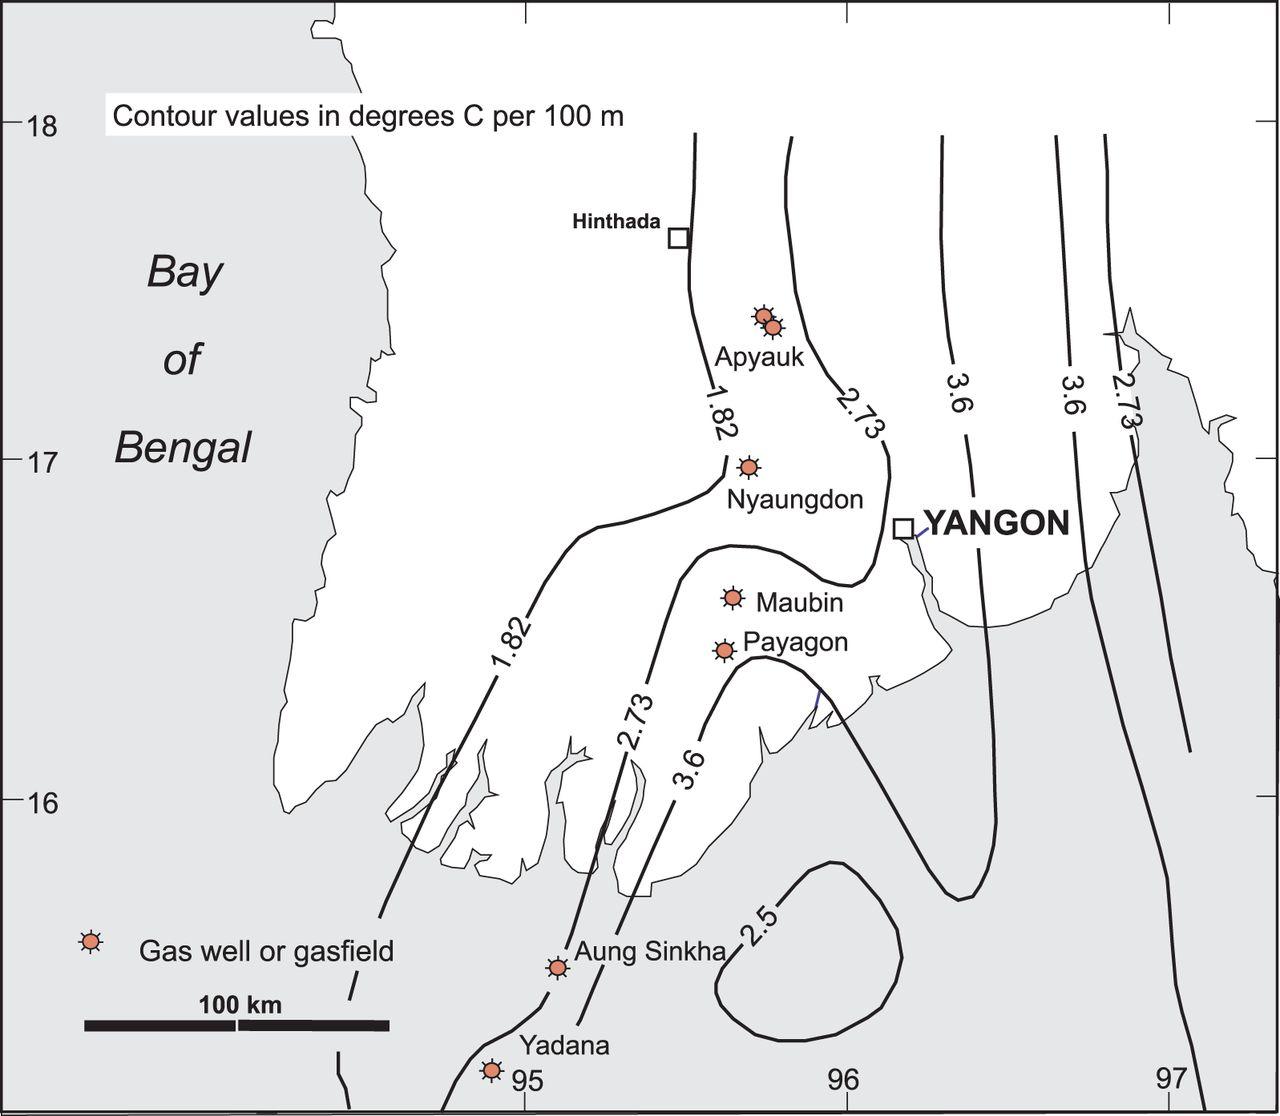 Onshore petroleum geology of myanmarcentral burma depression view largedownload slide fandeluxe Choice Image